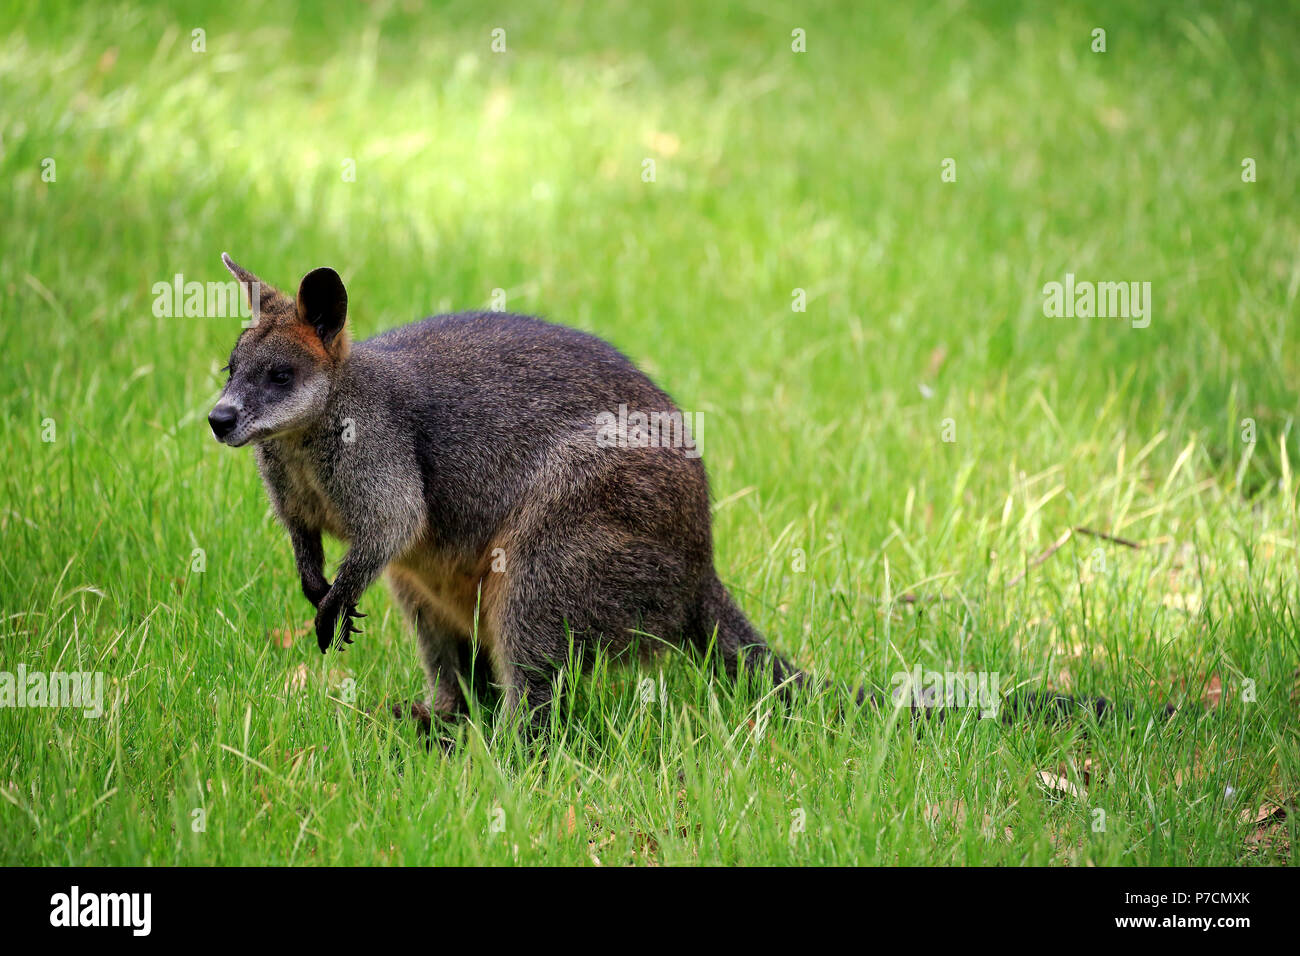 Swamp Wallaby, Mount Lofty, South Australia, Australia, (Wallabia bicolor) - Stock Image